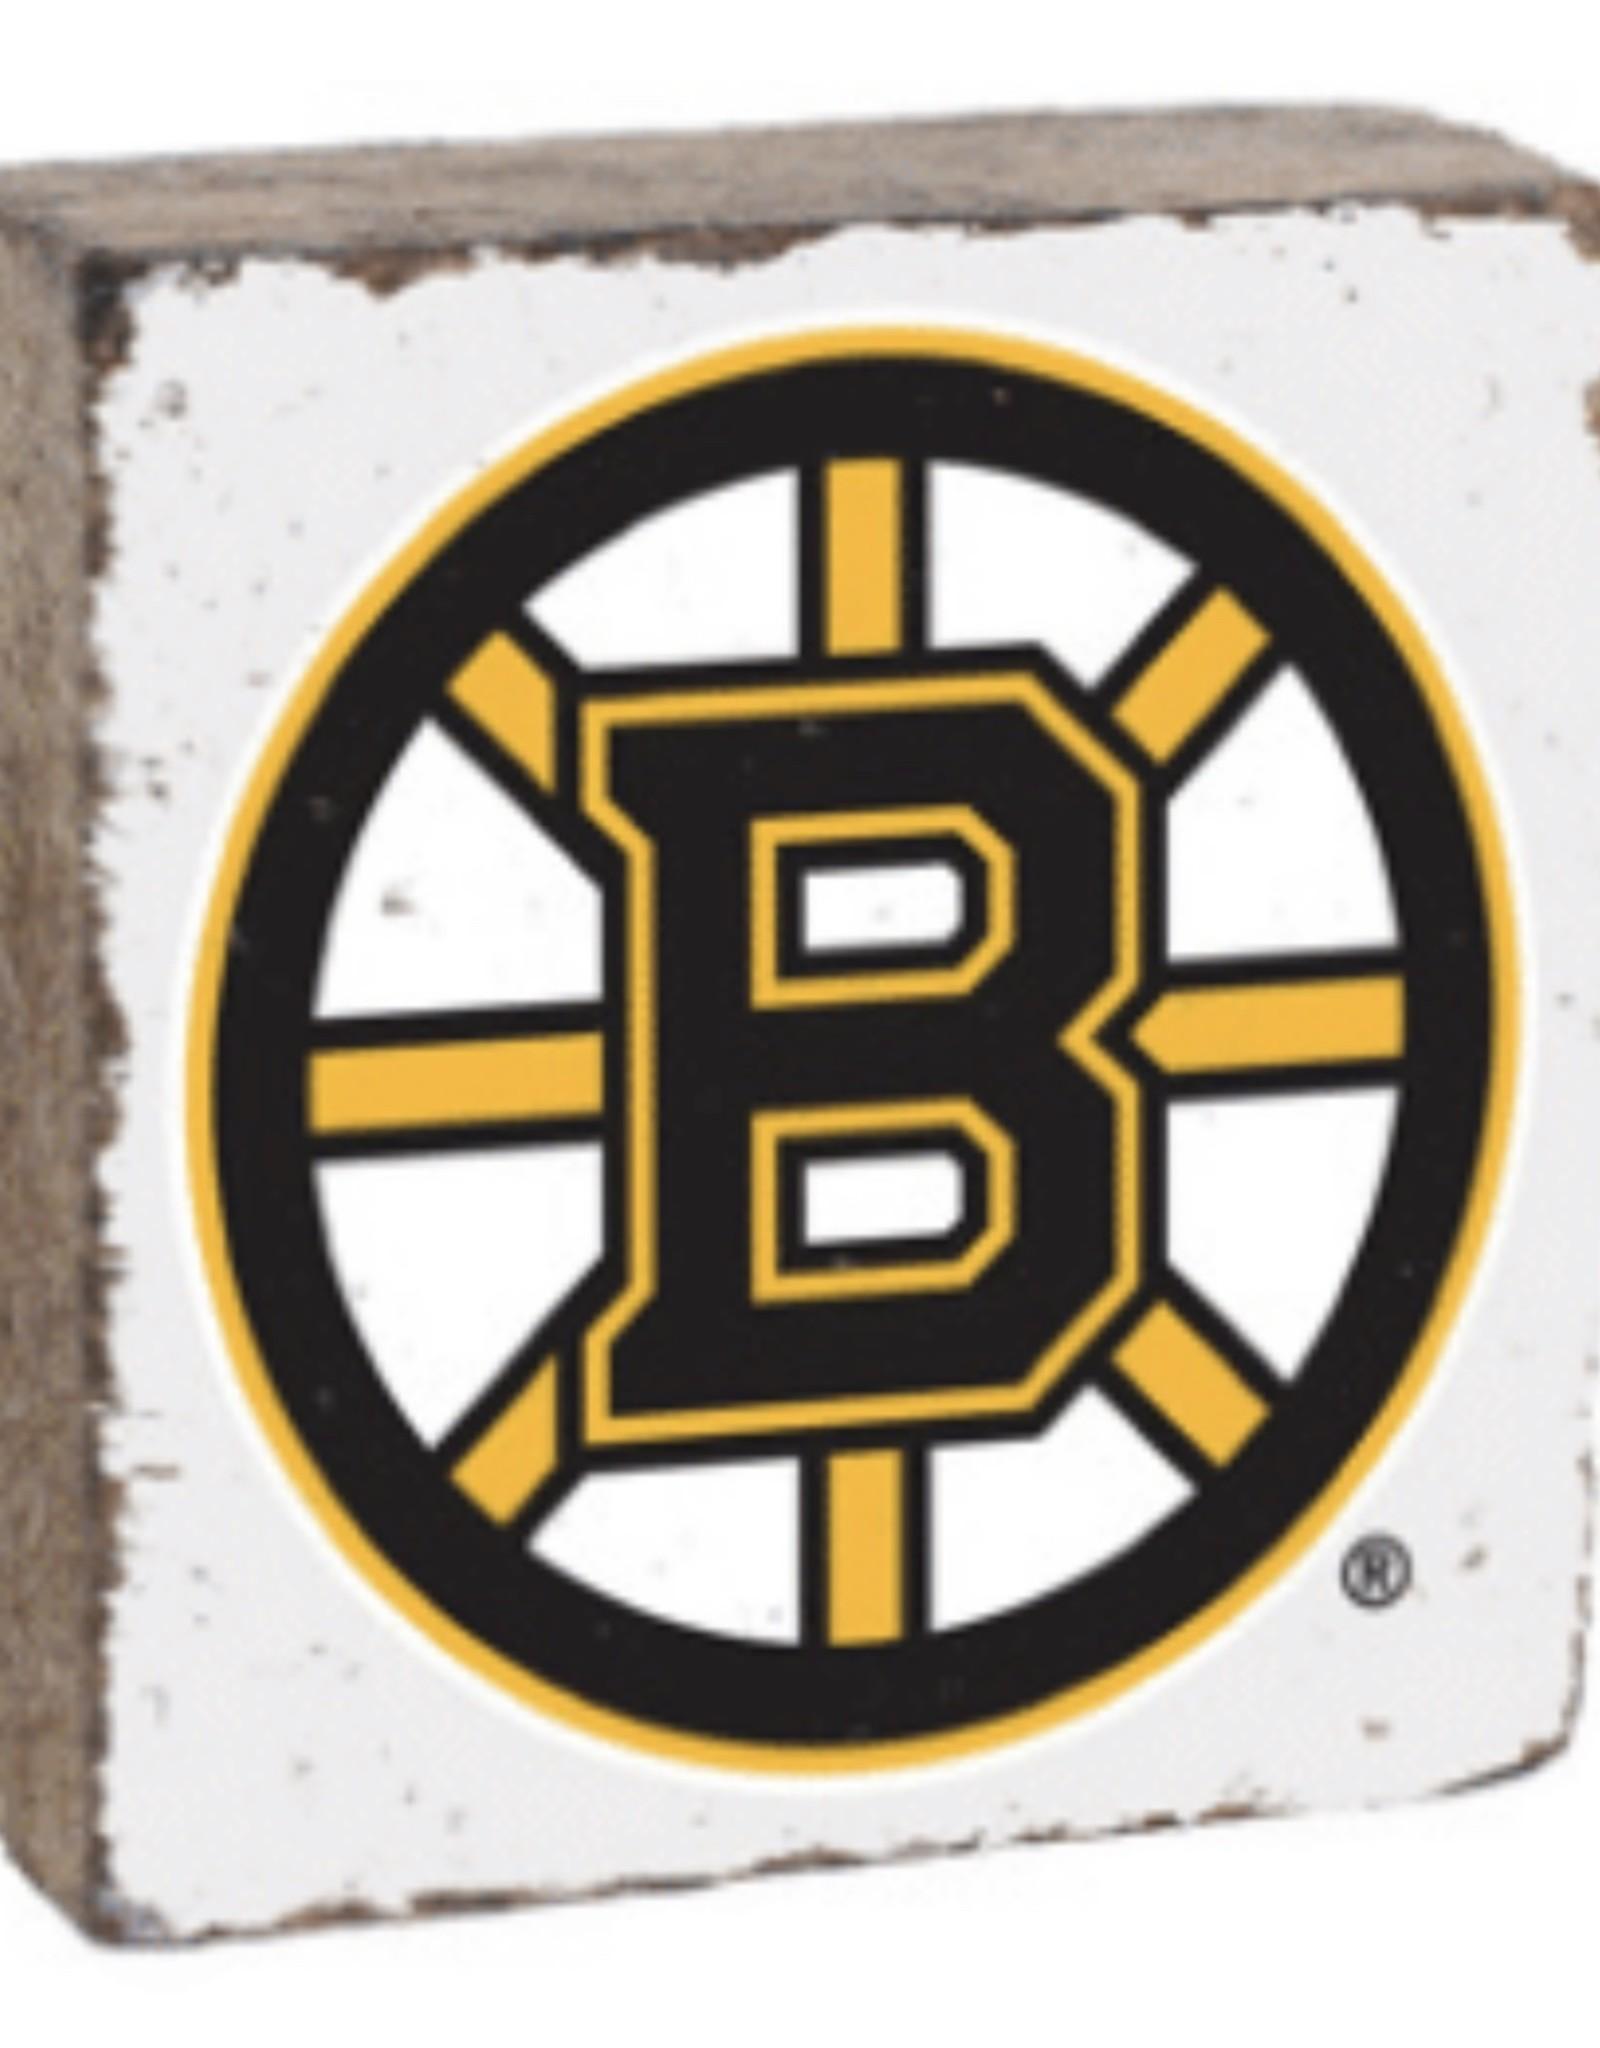 Rustic Marlin Rustic Marlin - NHL Bruins Block - White